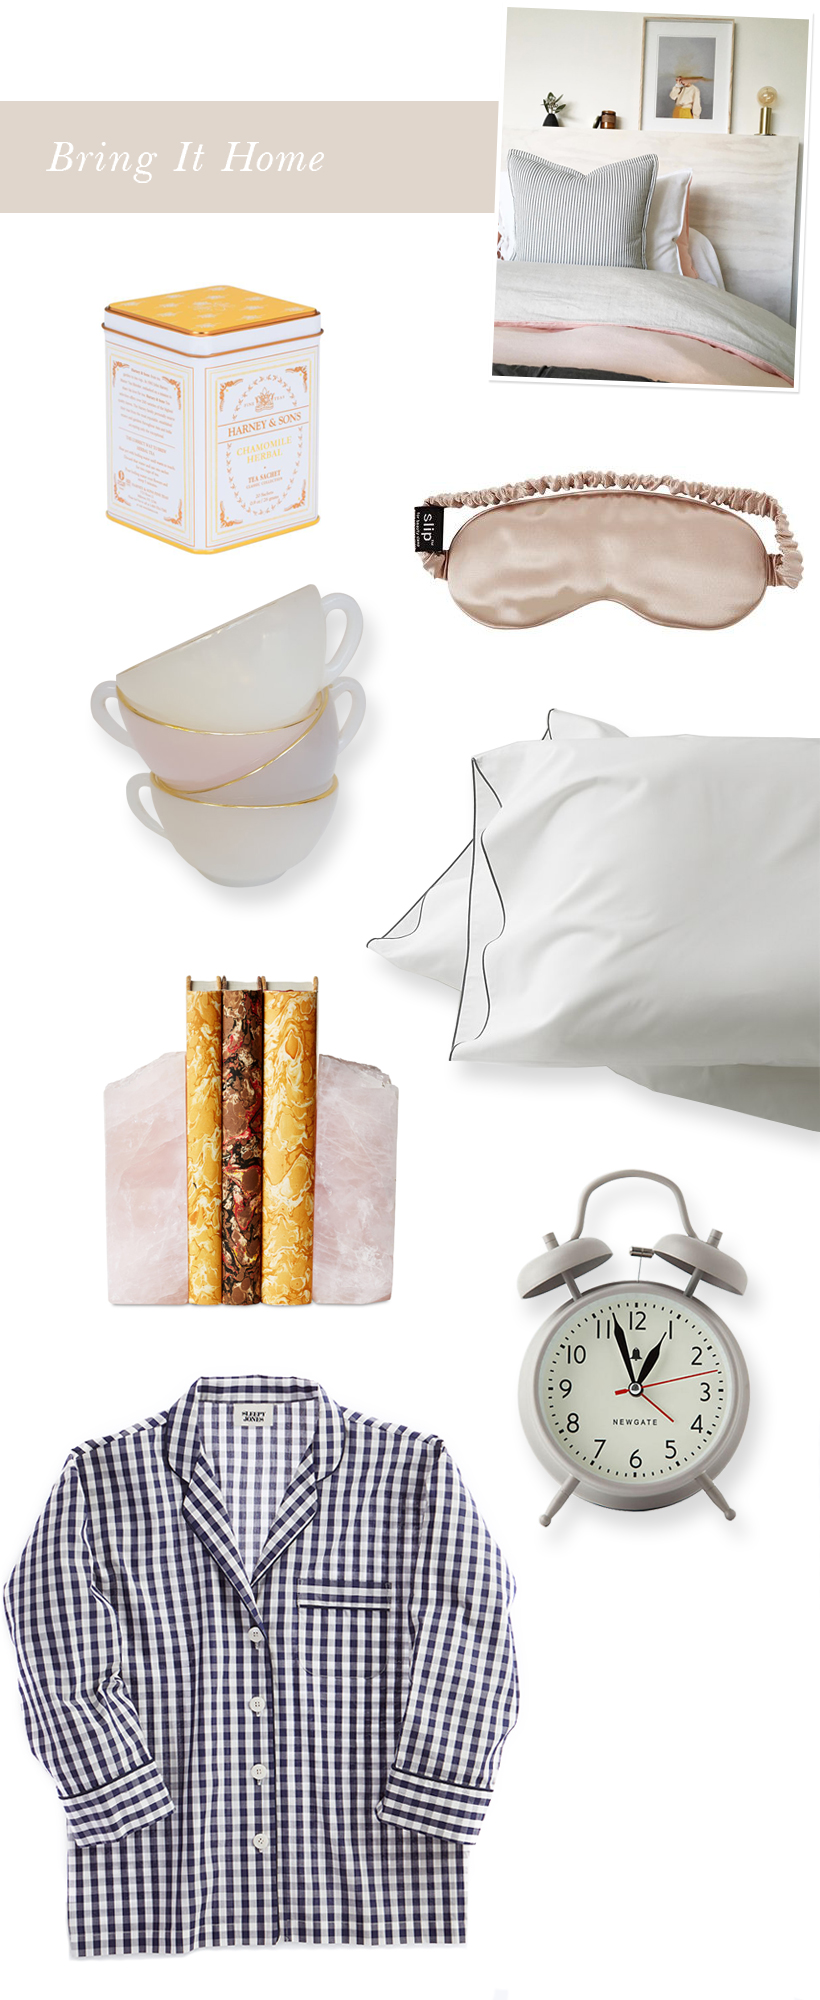 bring-it-home-sleep-better